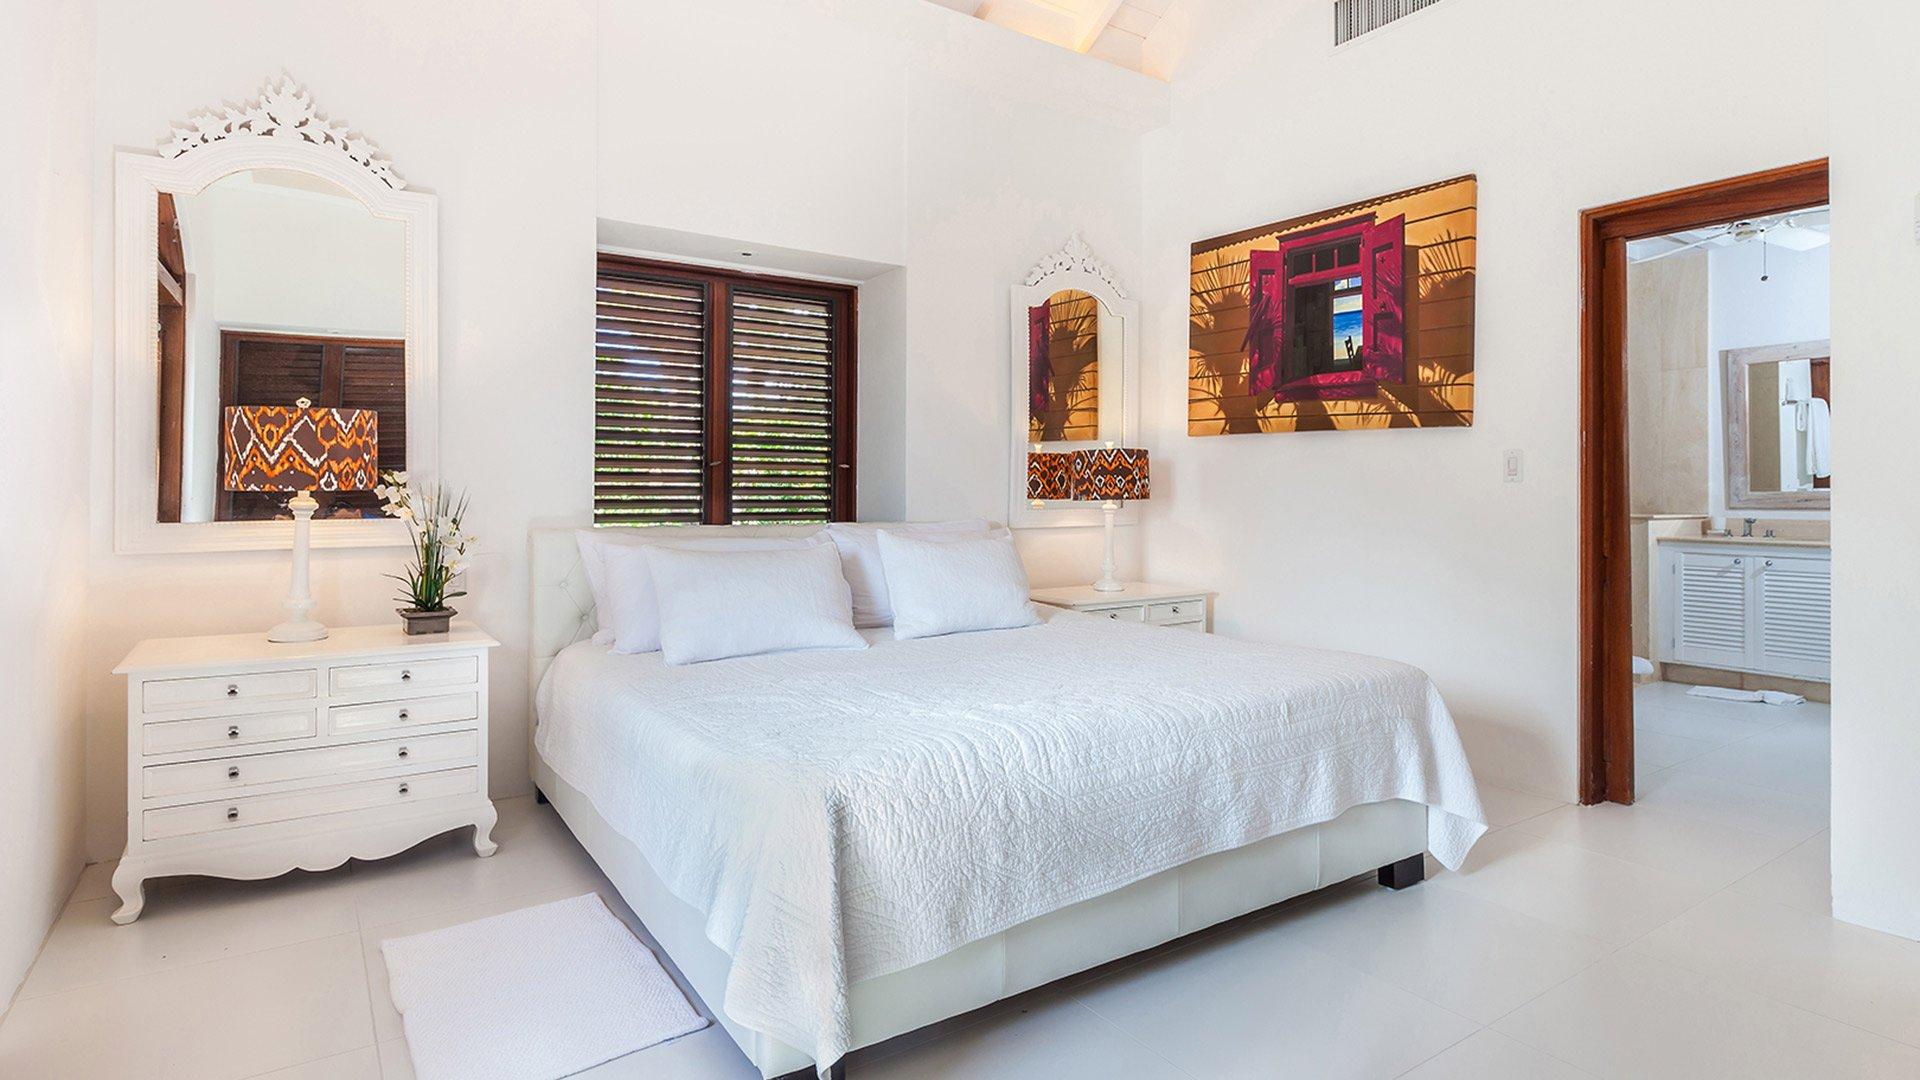 Indigo Villa Anguilla Rental Properties in Paradise bedroom